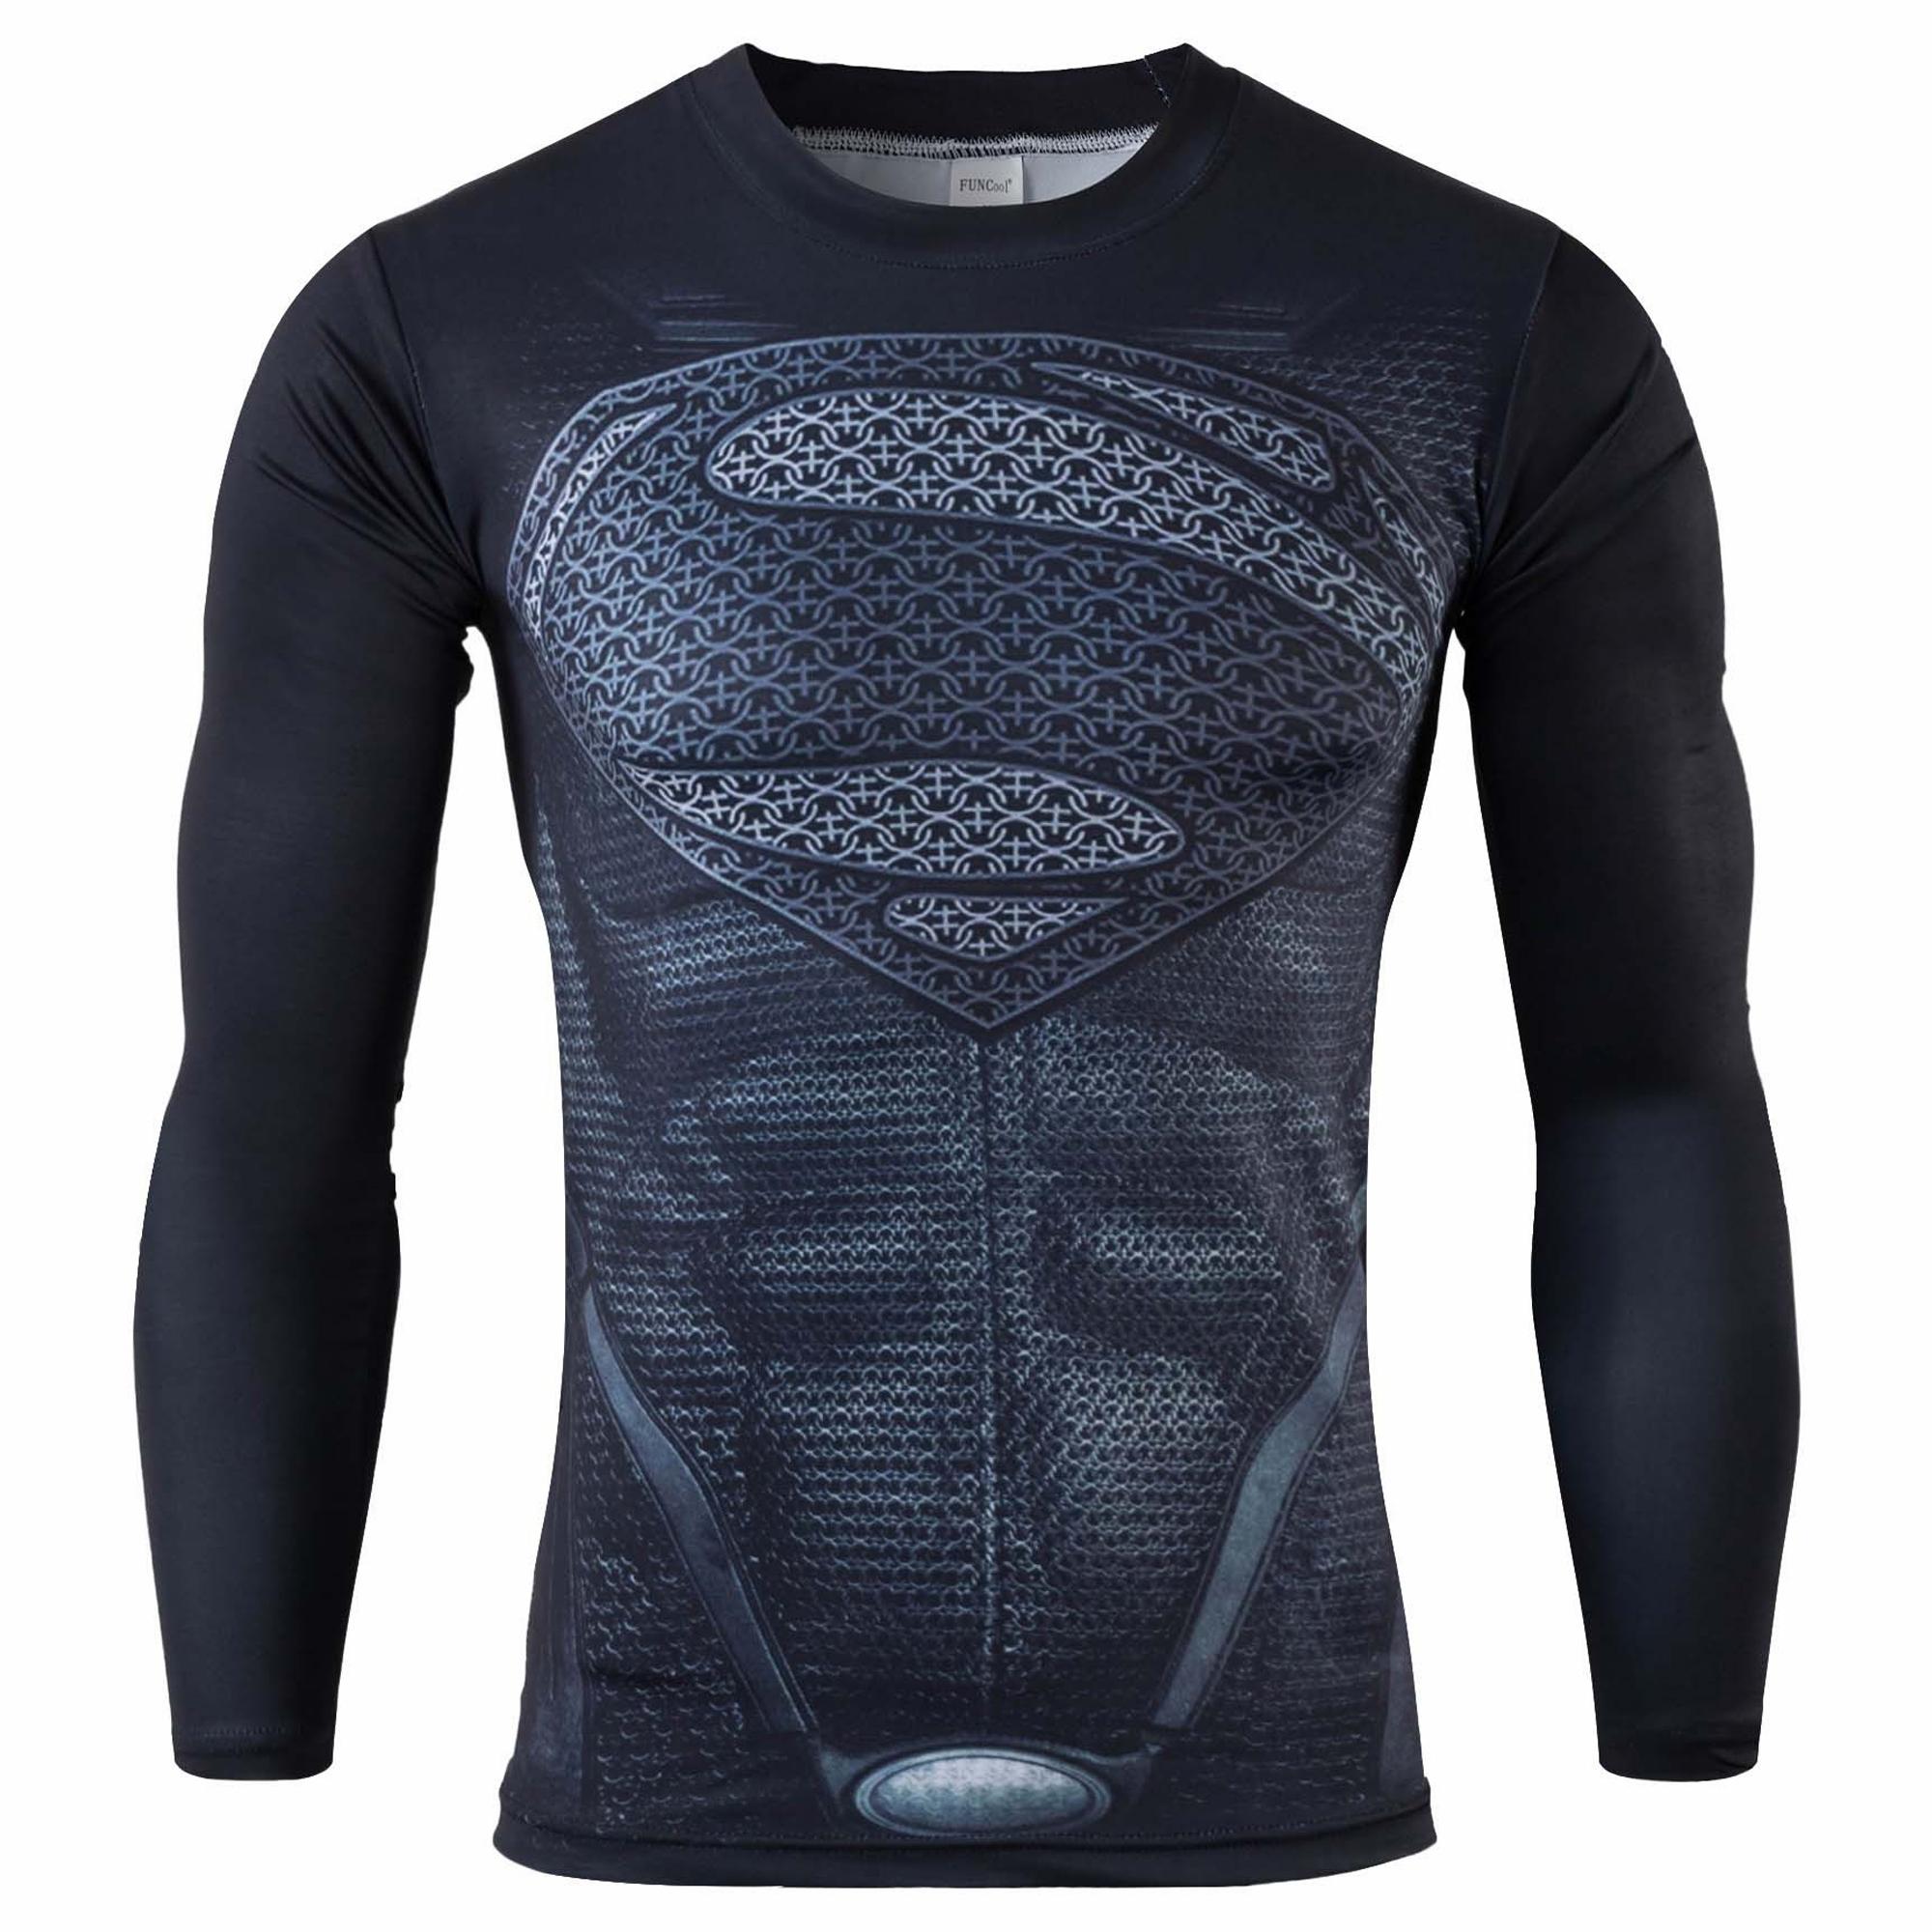 2016 long sleeve t shirt men Superman Batman Spiderman Ironman Captain America Avengers Costume Superhero Soldier Marvel Comics(China (Mainland))